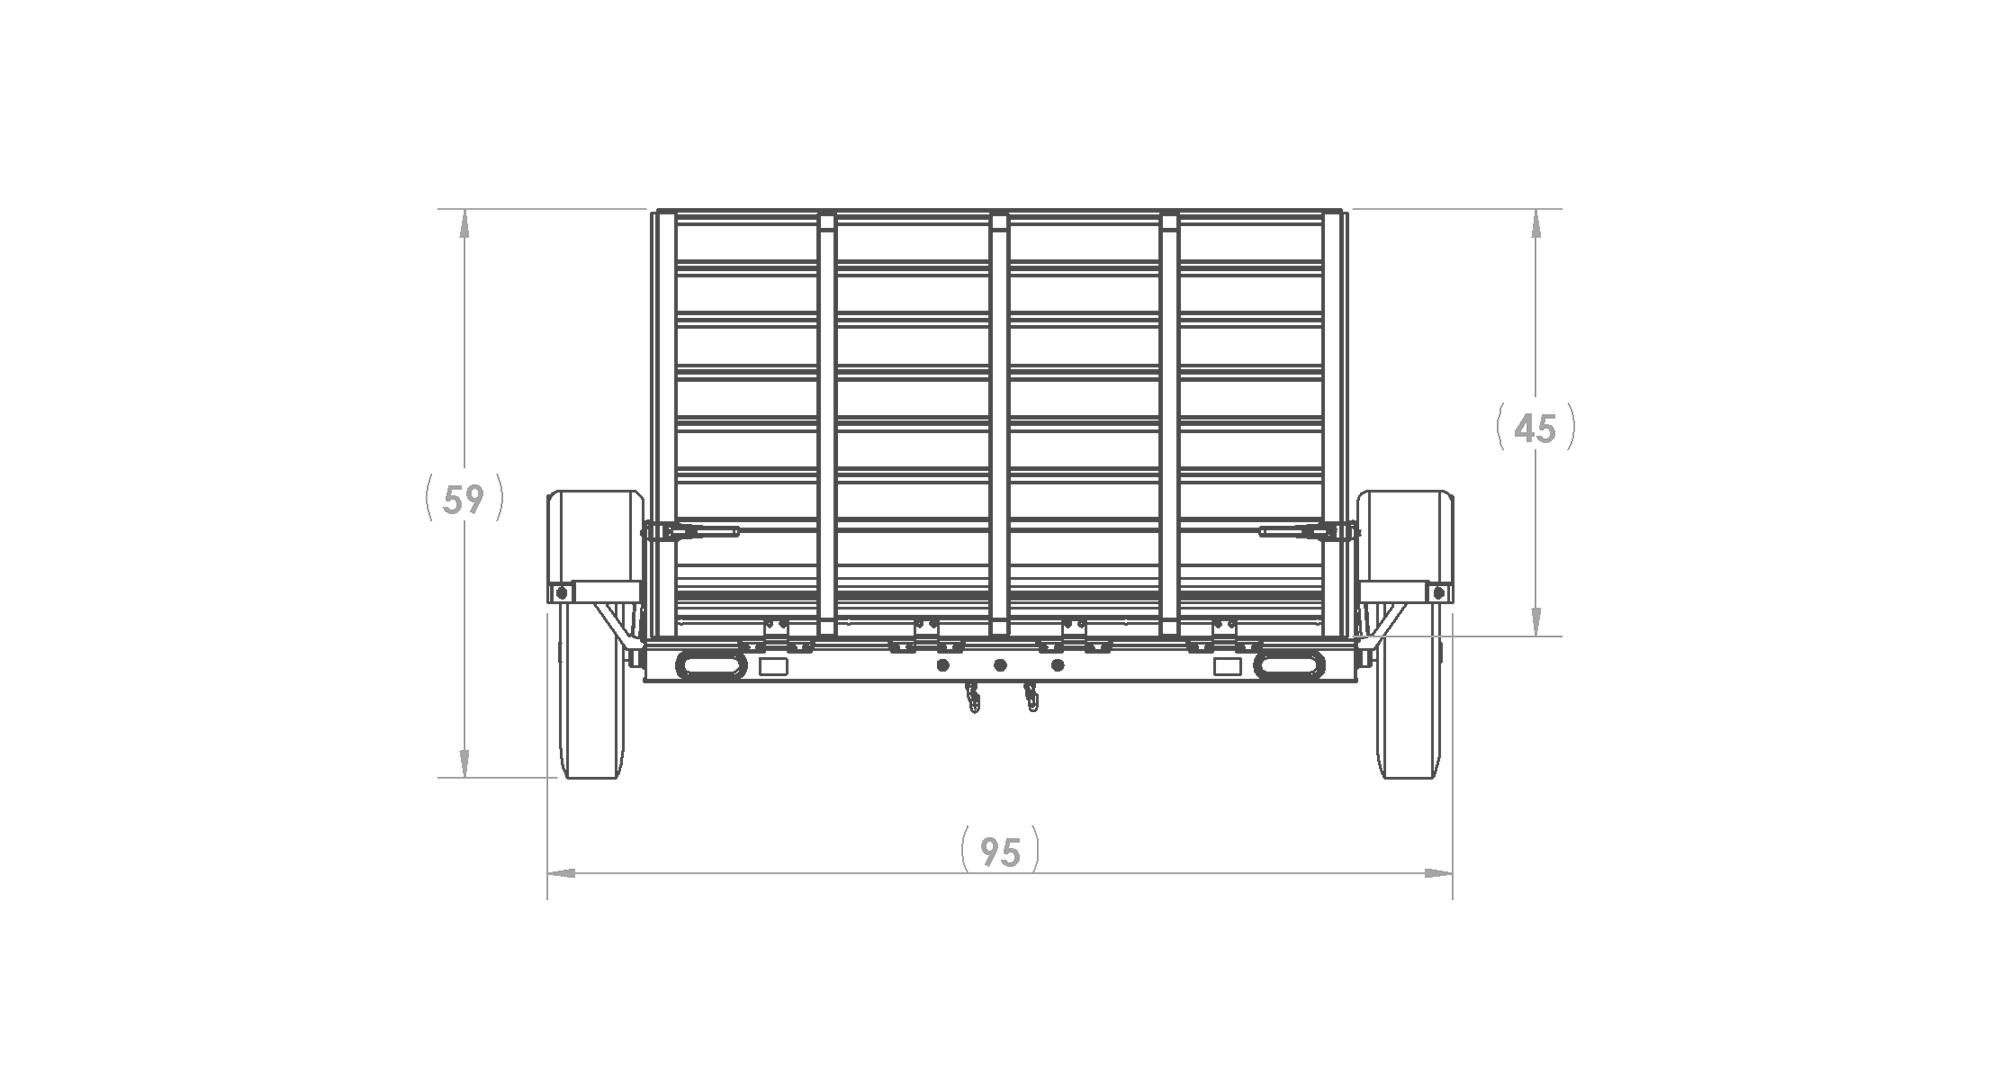 6 X 10 Ft Aluminum Utility Trailer